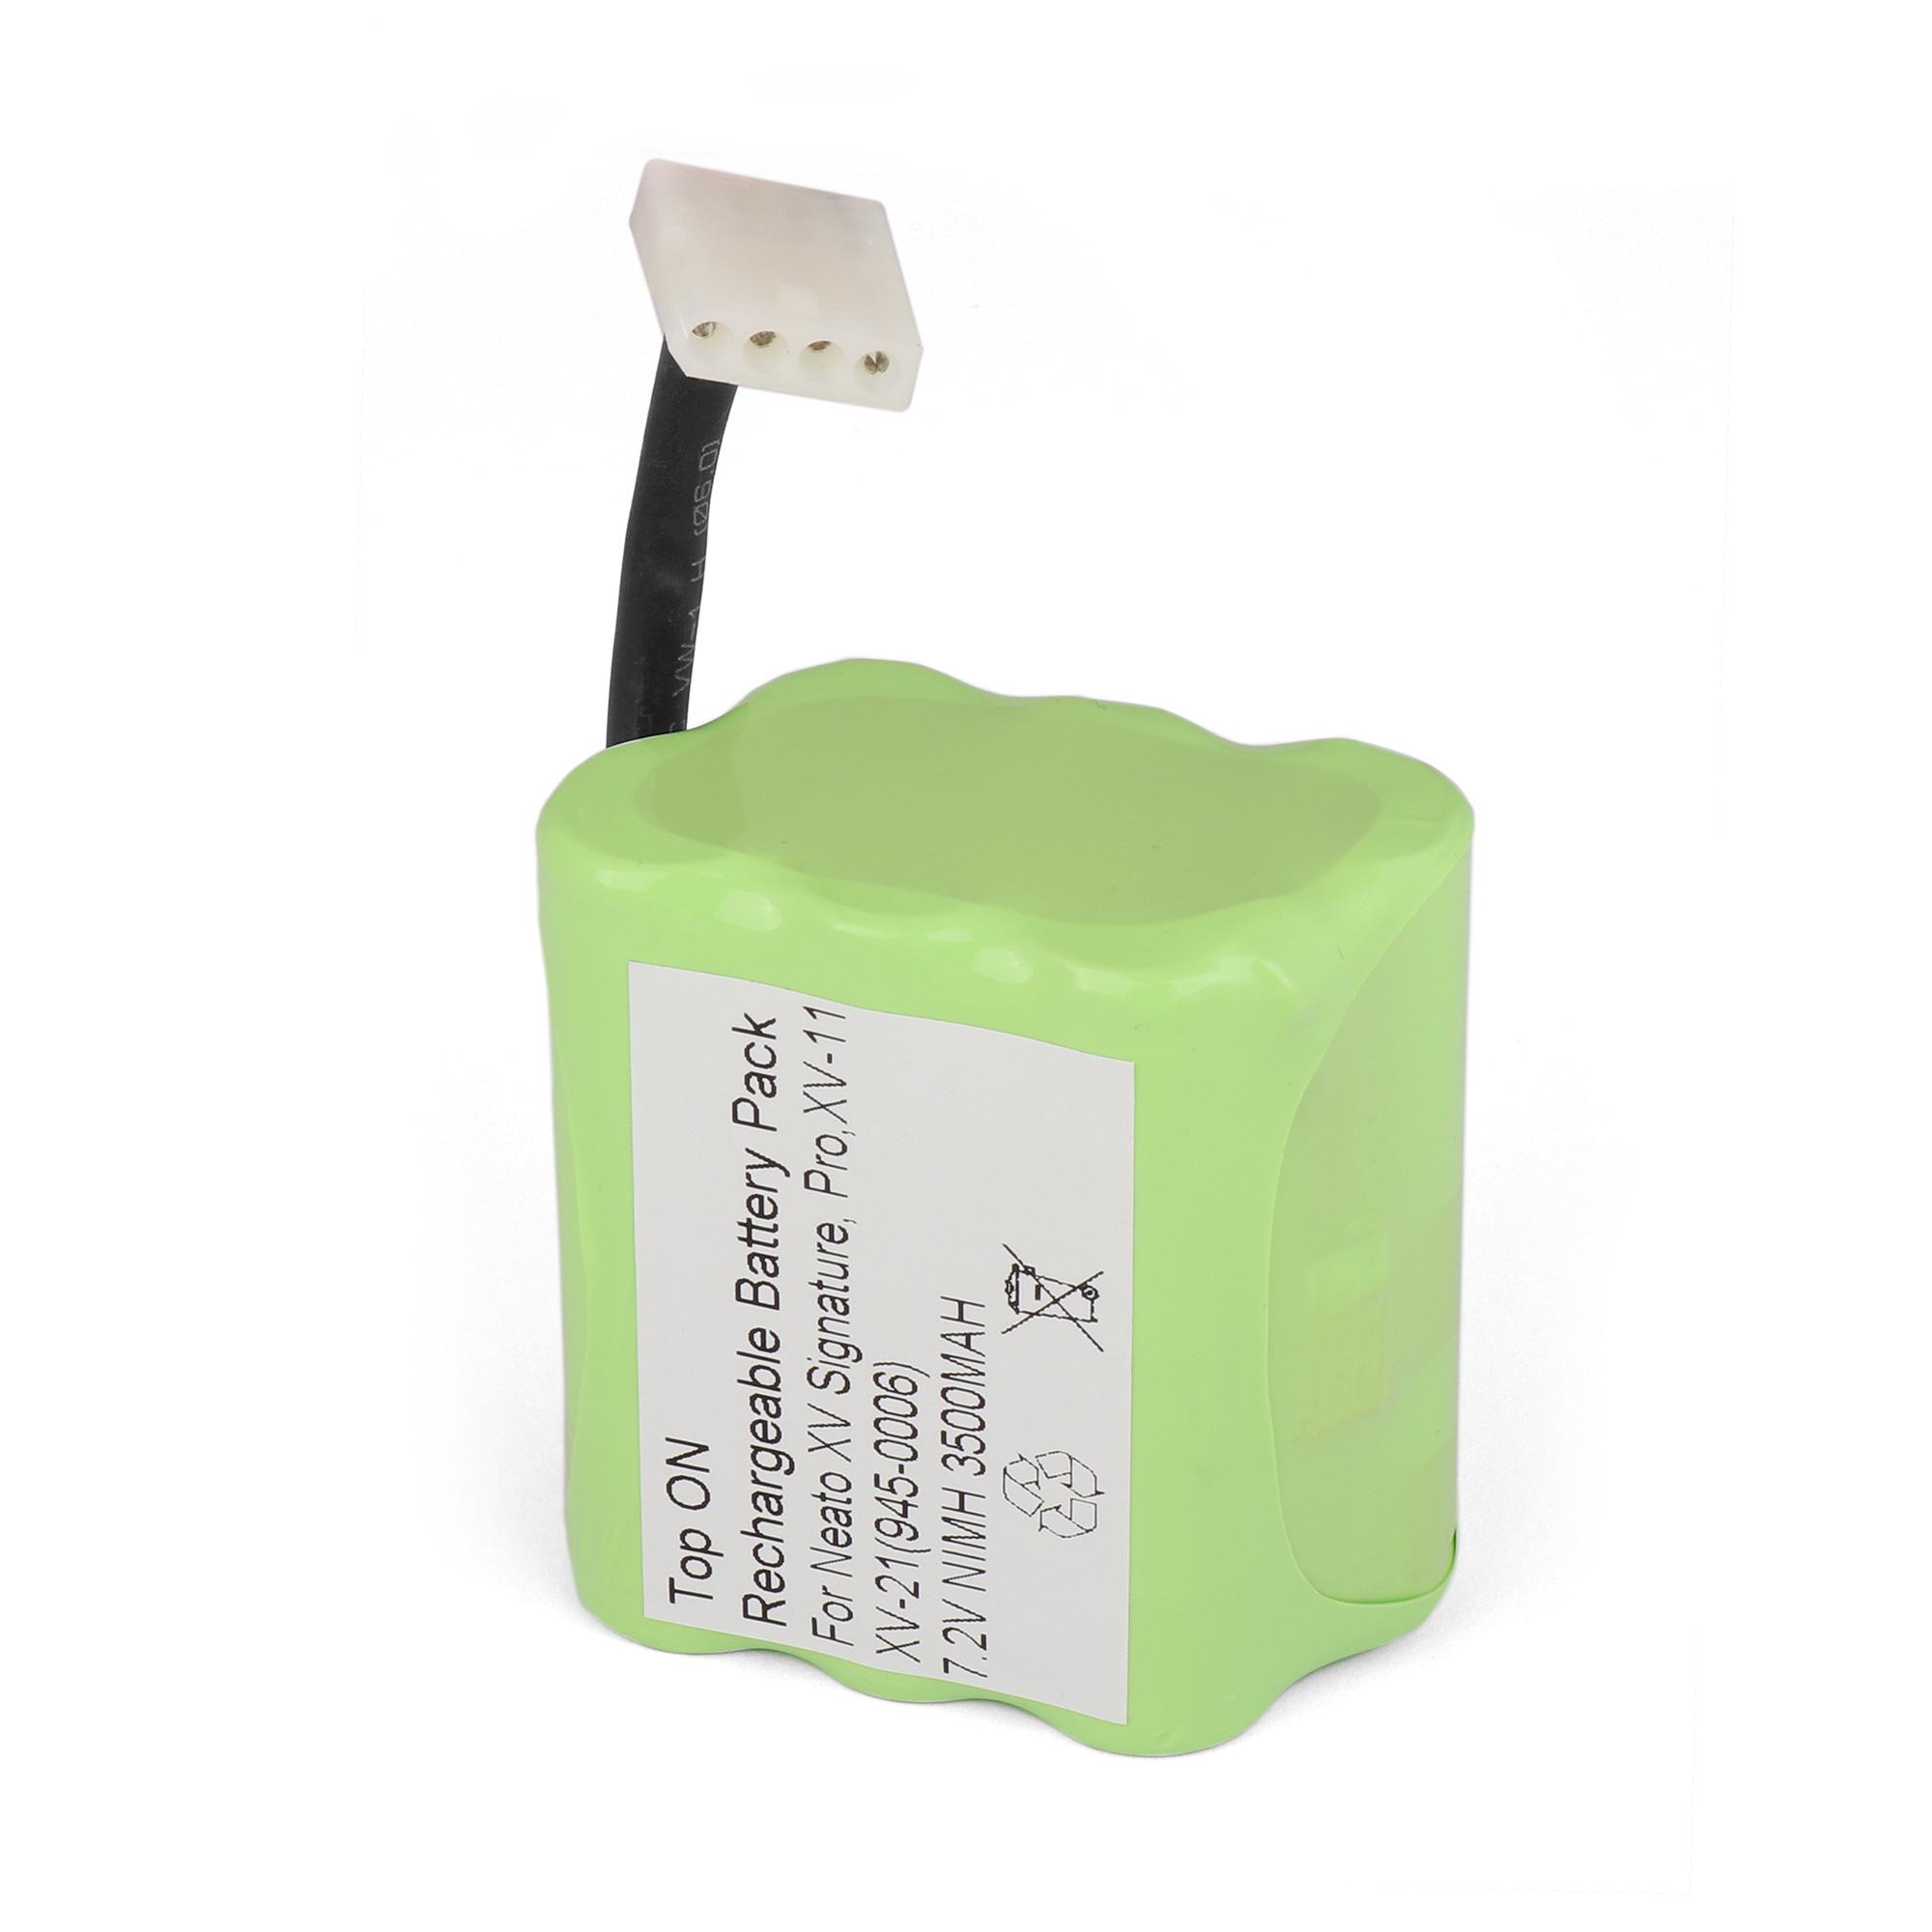 Аккумулятор, батарея для беспроводного робота-пылесоса Neato XV Signature, Pro, XV-11, XV-